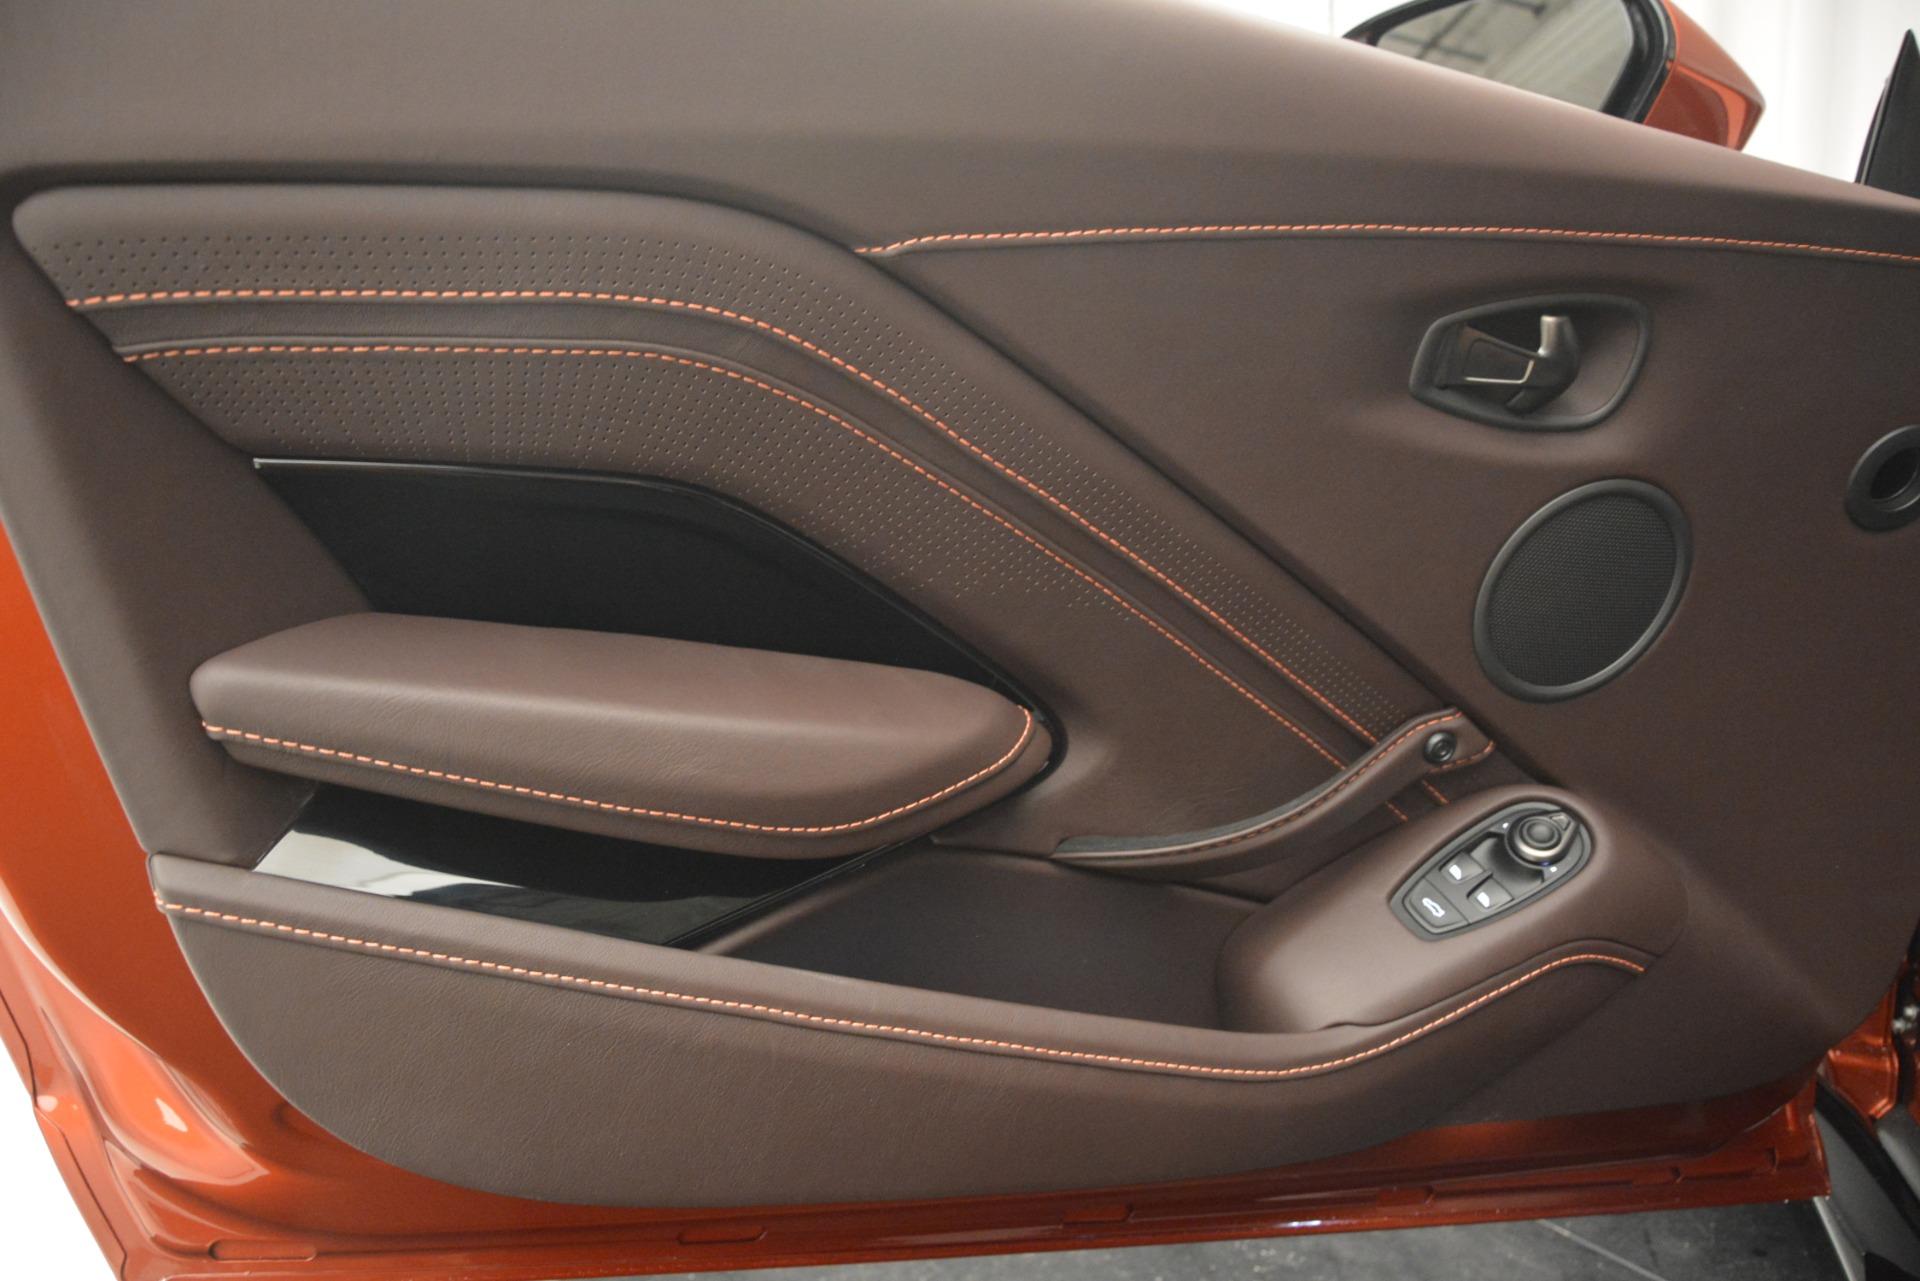 Used 2019 Aston Martin Vantage Coupe For Sale In Greenwich, CT. Alfa Romeo of Greenwich, A1342B 2784_p18